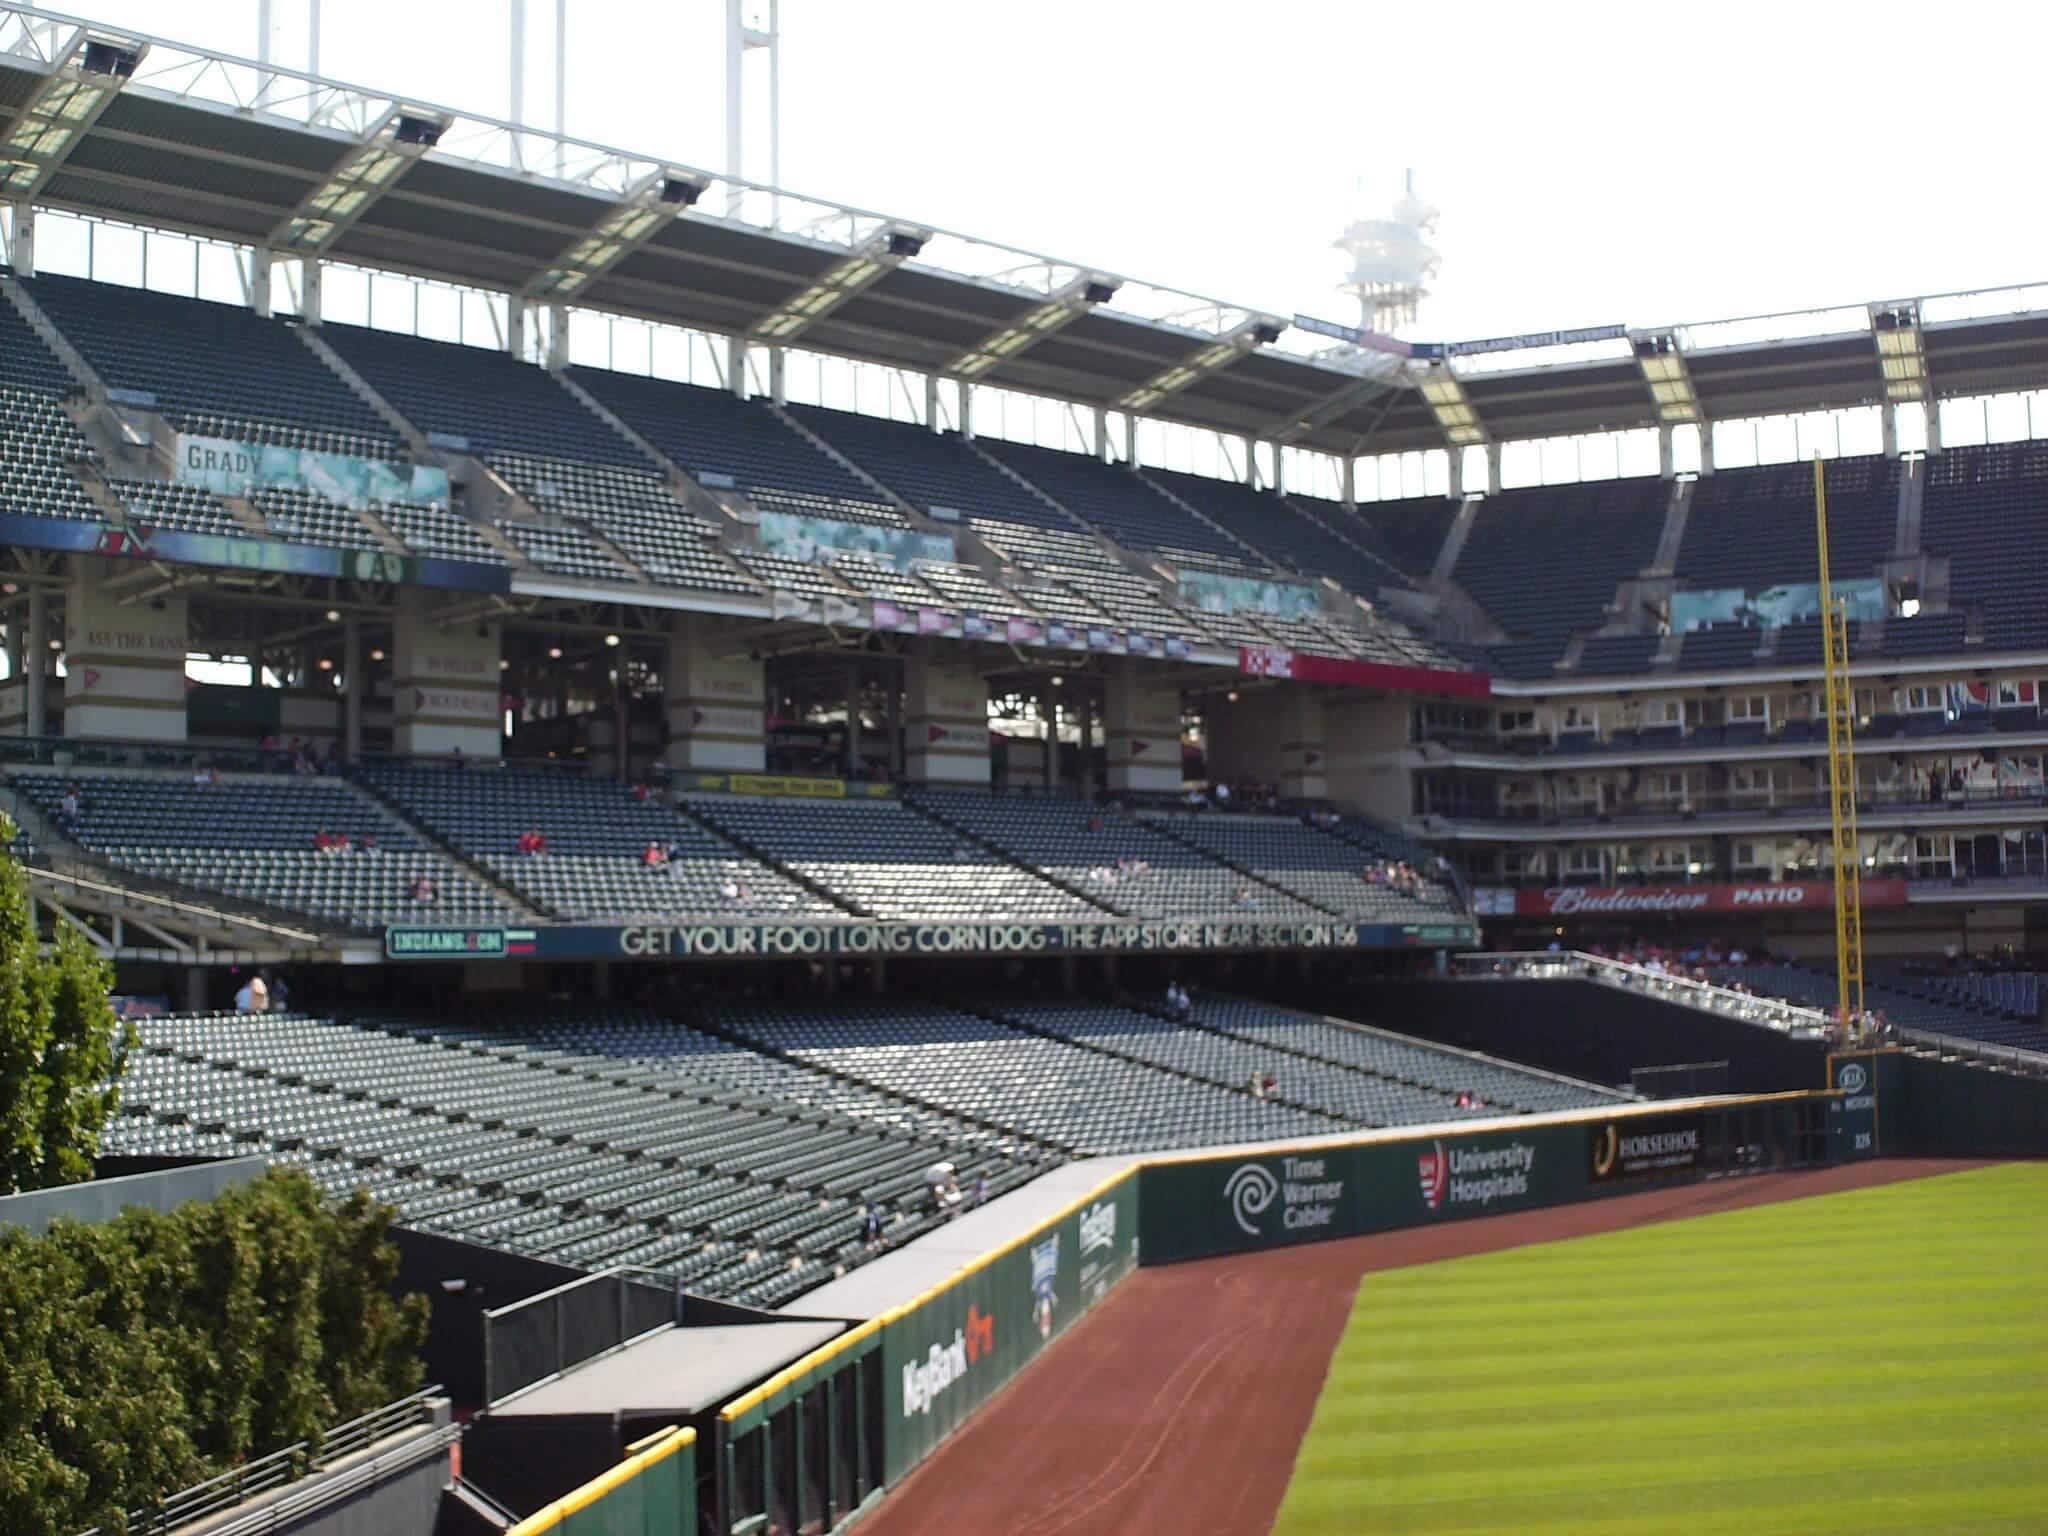 Progressive Field ballpark